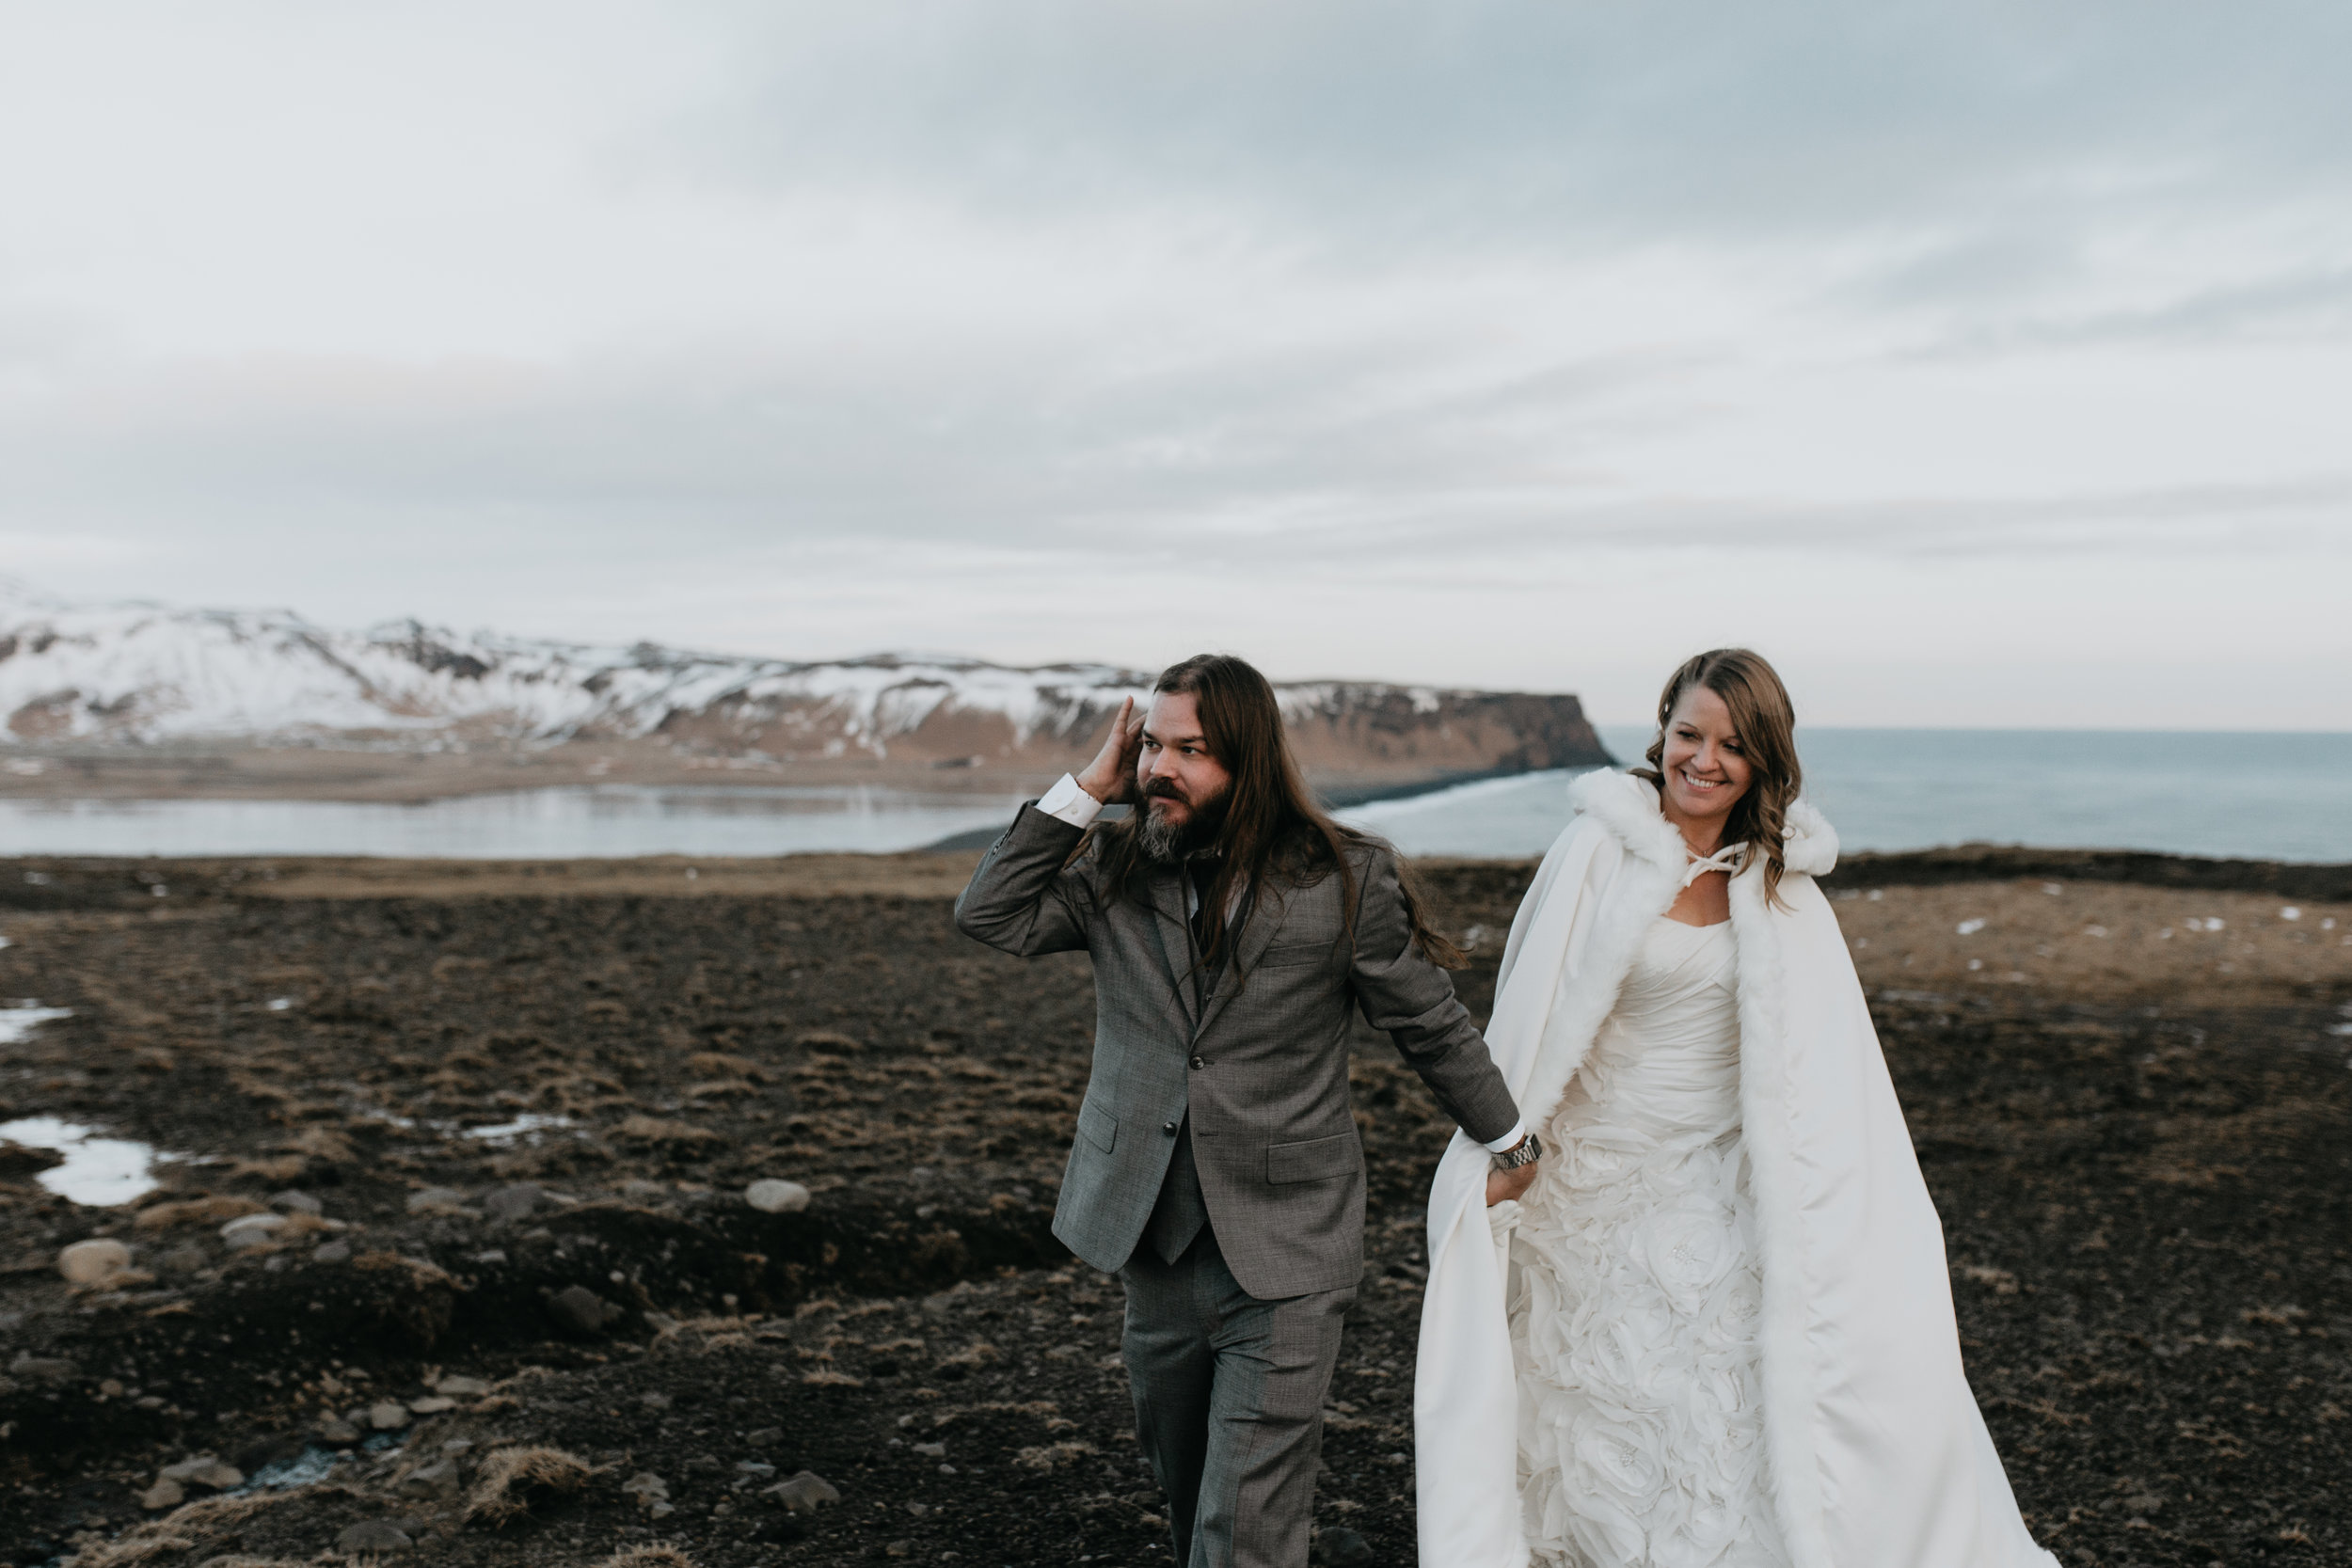 nicole-daacke-photography-iceland-winter-sunset-adventure-elopement-skogafoss-waterfall-black-sand-beach-dyrholaey-vik-iceland-intimate-wedding-black-church-elopement-photographer-35.jpg